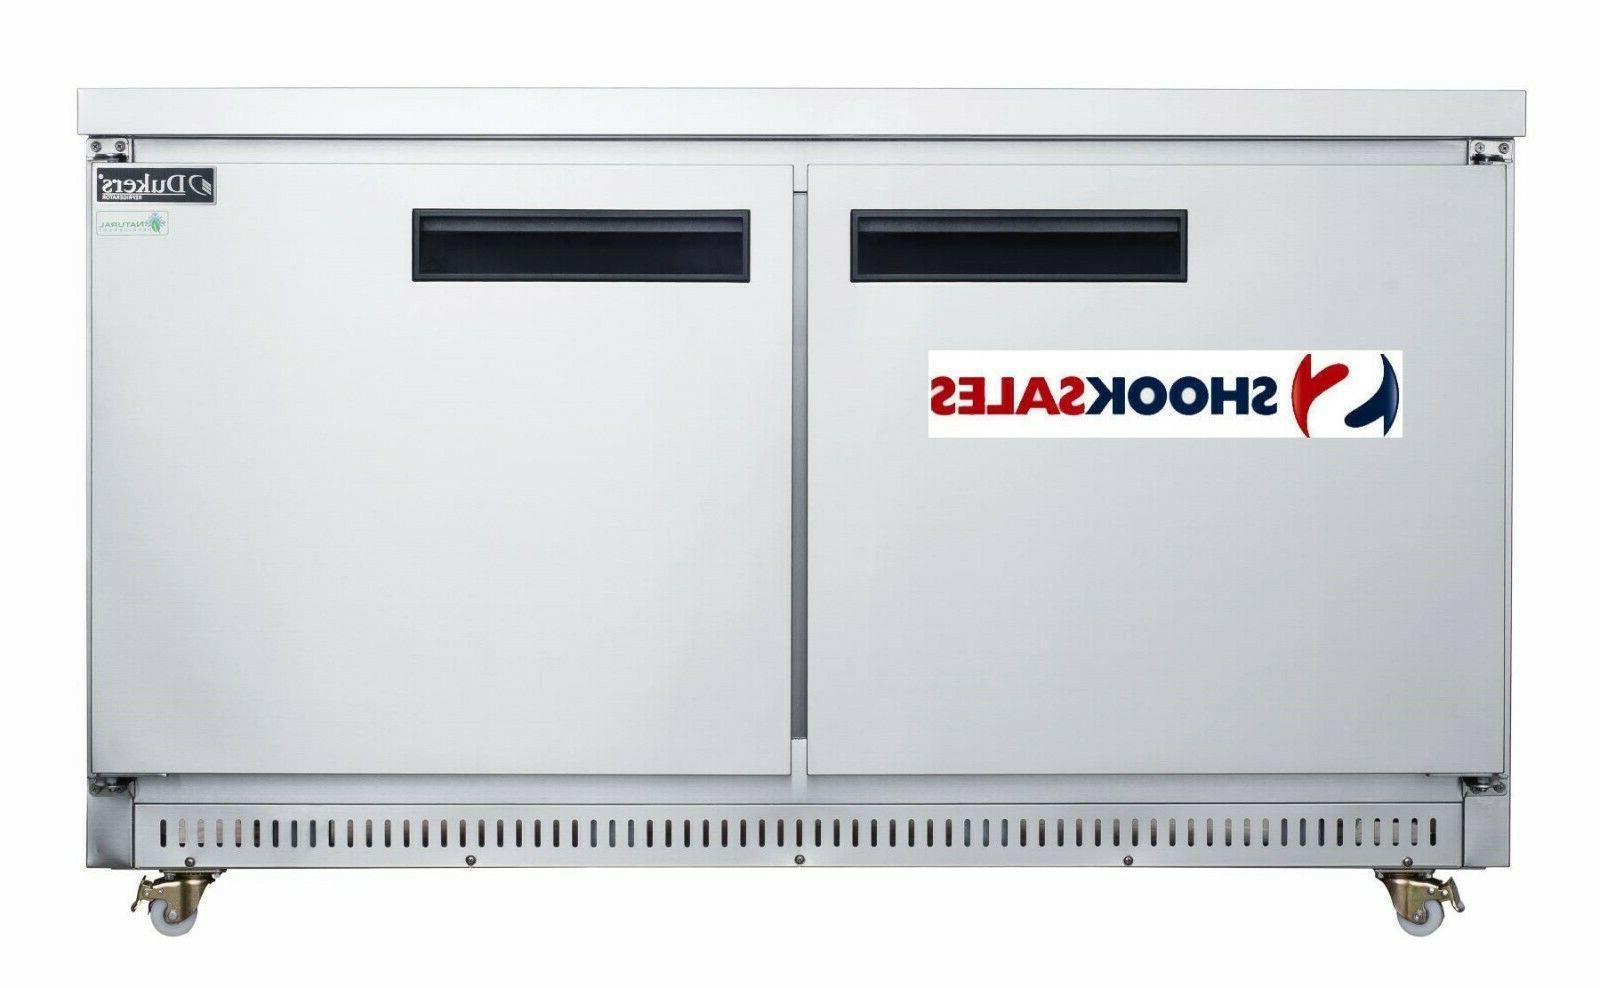 Dukers DUC60F Freezer 15.5 cu. GREAT